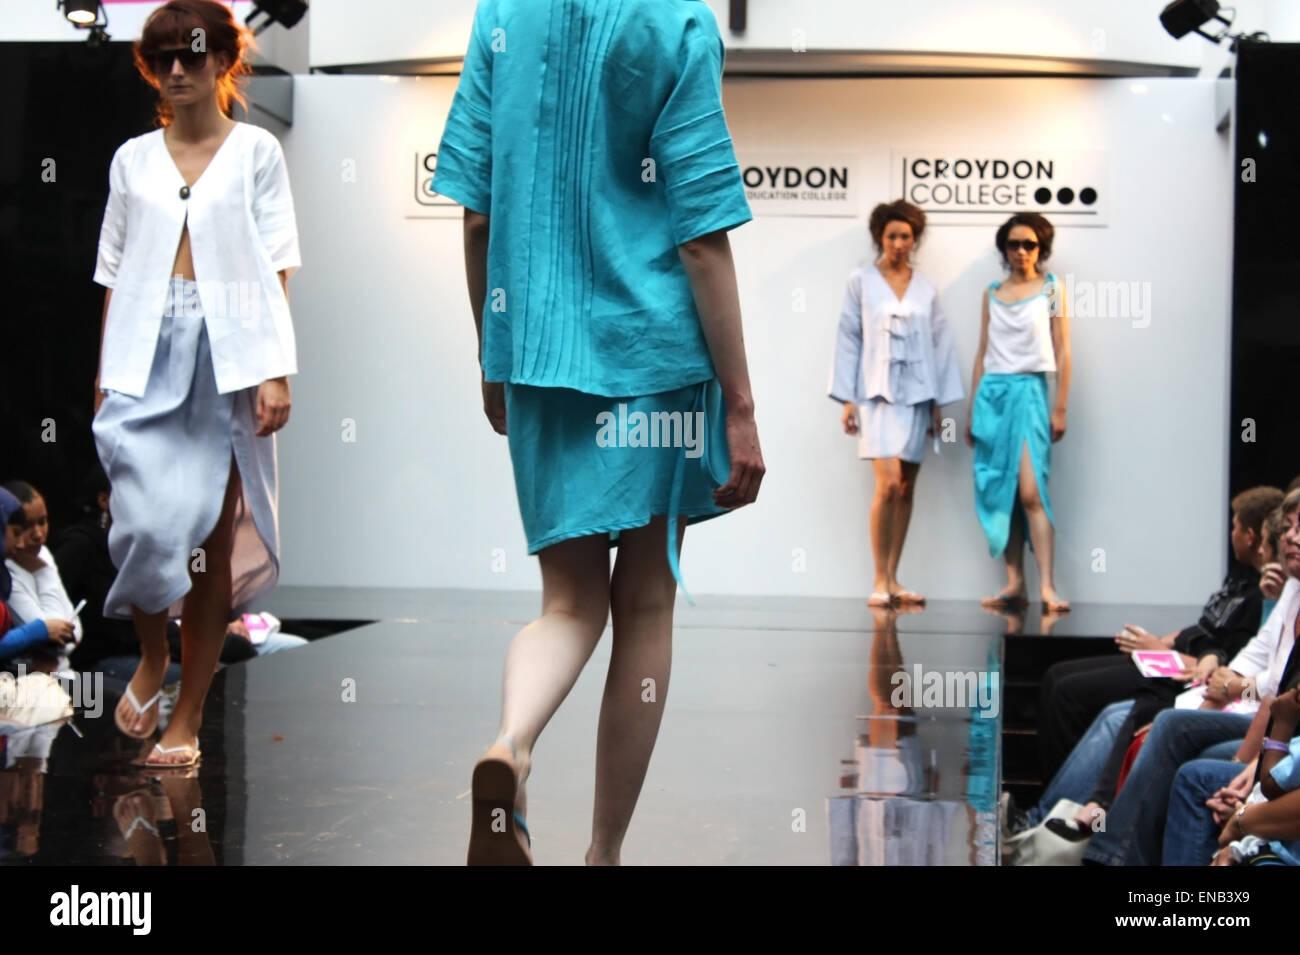 CROYDON, LONDON - JUNE 18 : Models in Fashion Festival on June 18, 2008 in Whitgift Shopping Centre, Croydon, England - Stock Image